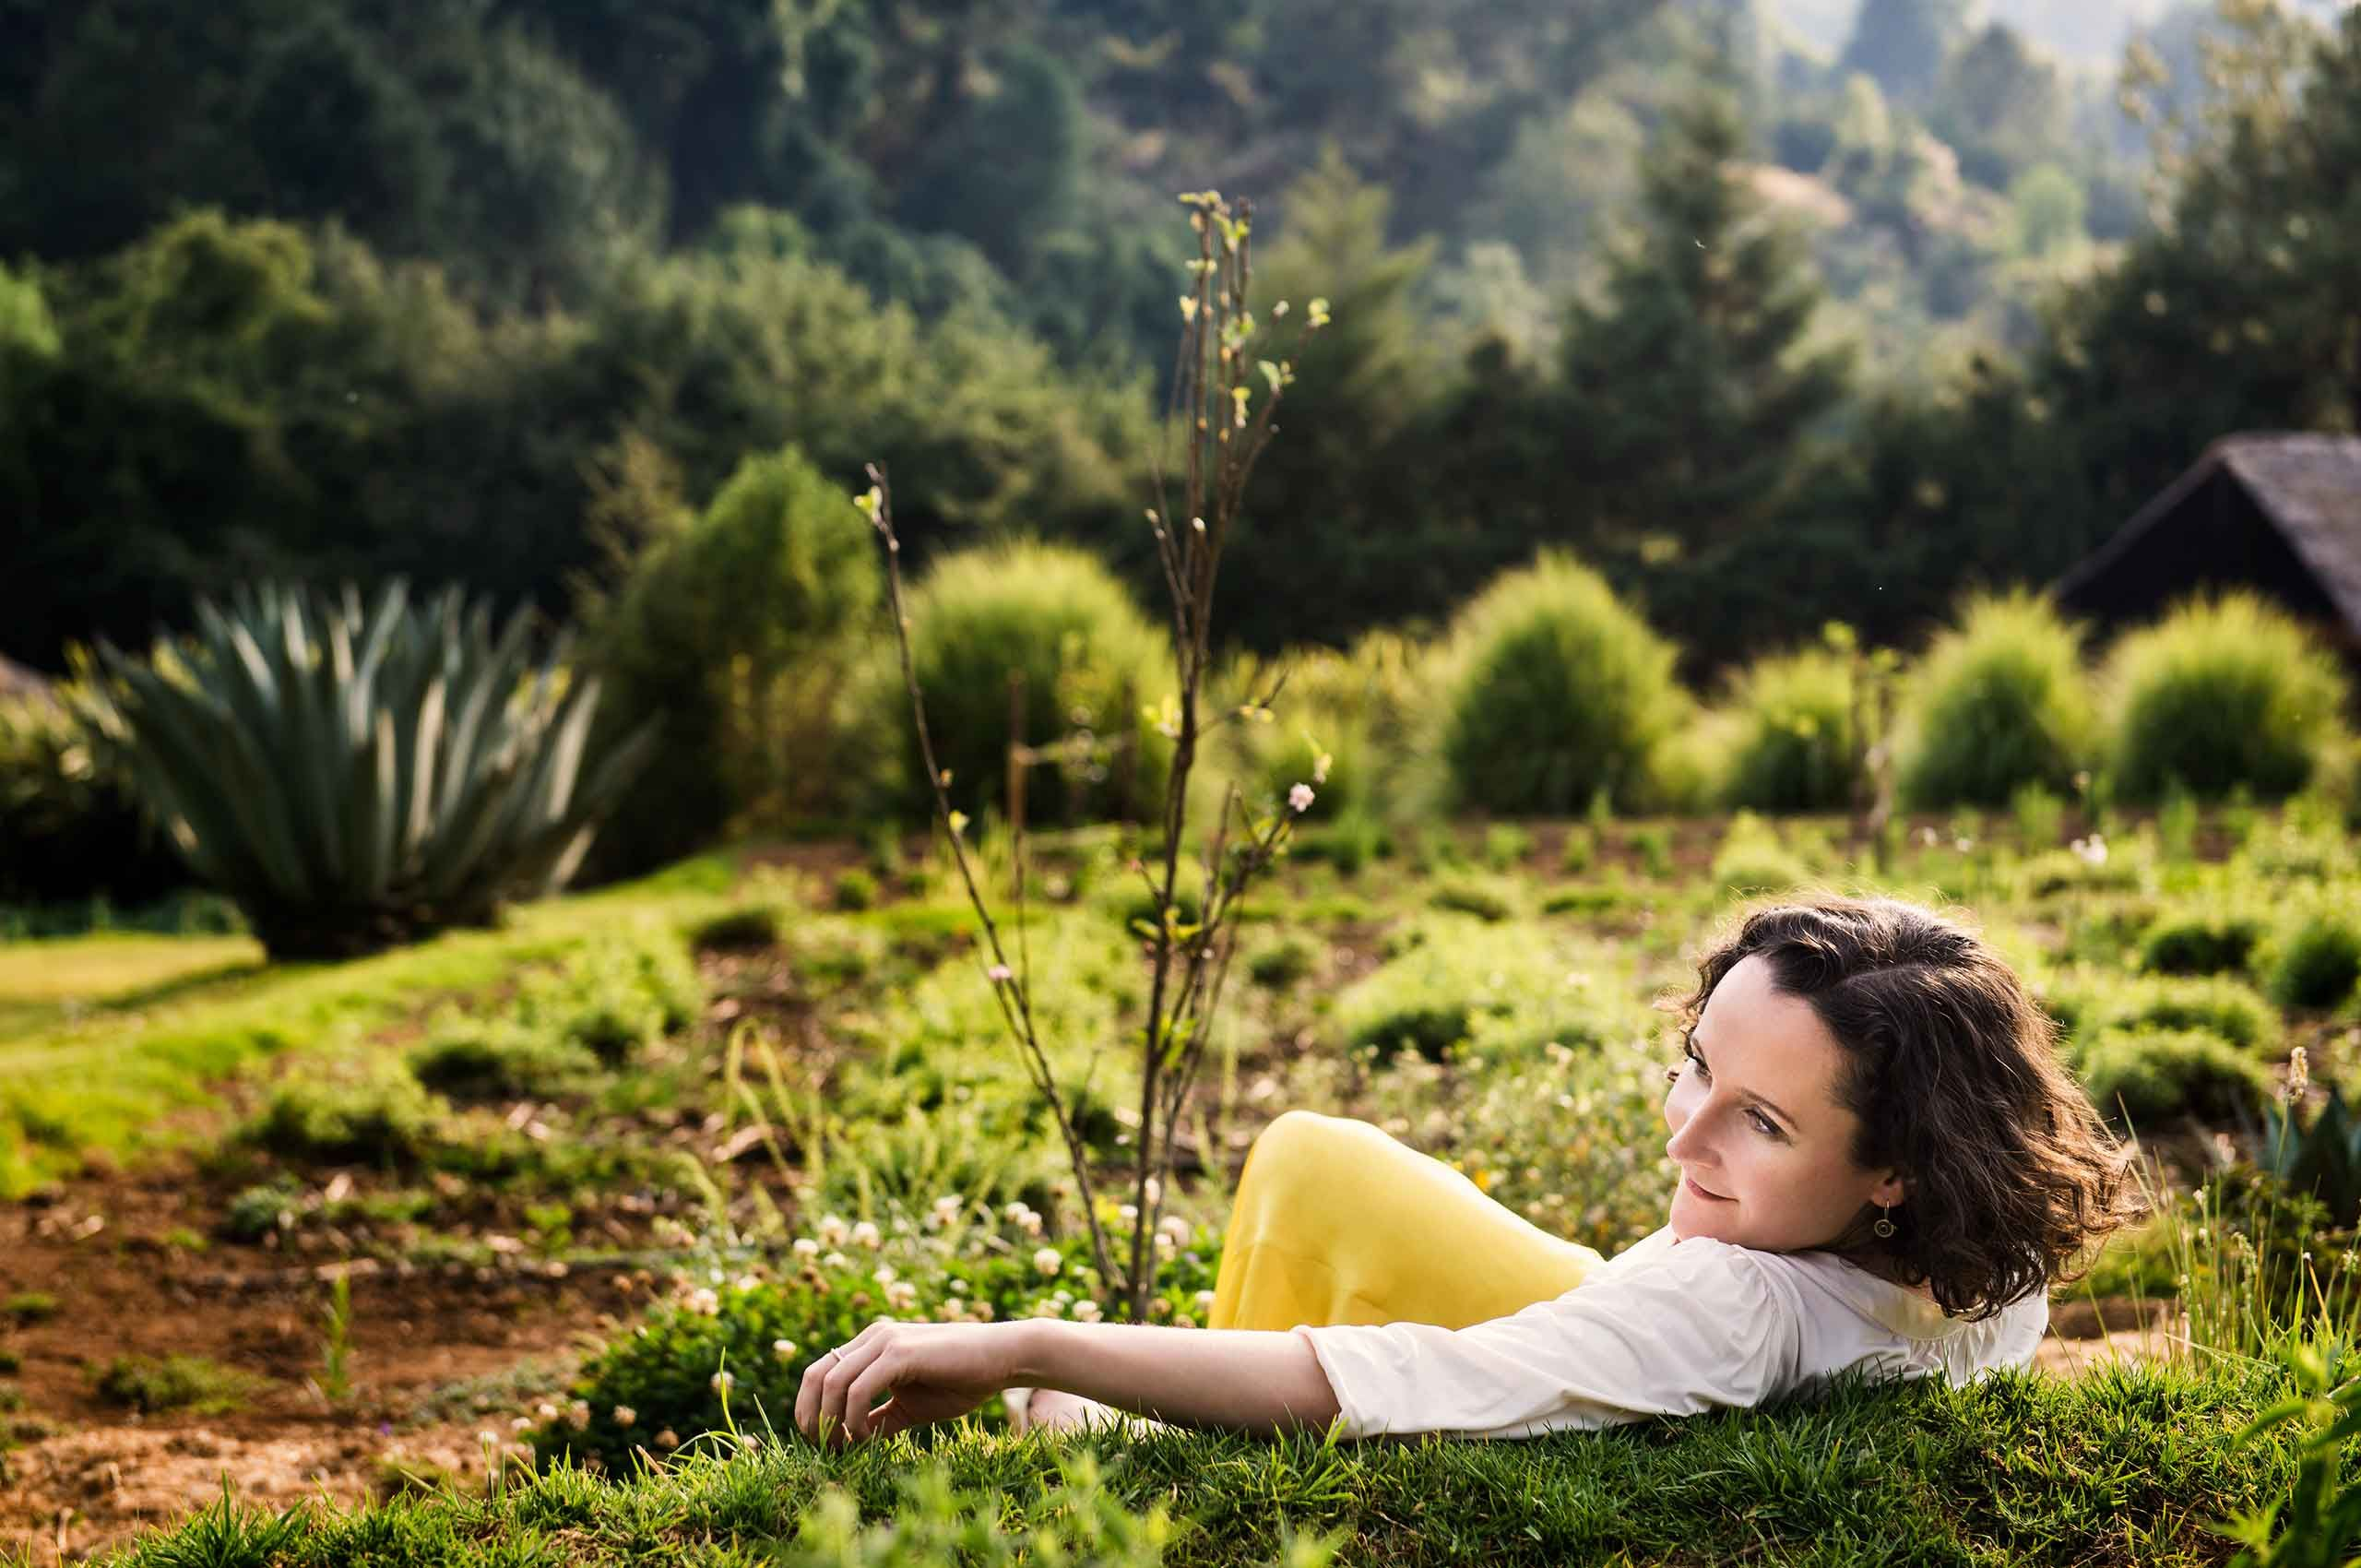 Woman-Lounging-in-MorningSun-in-nature-by-HenrikOlundPhotography.jpg